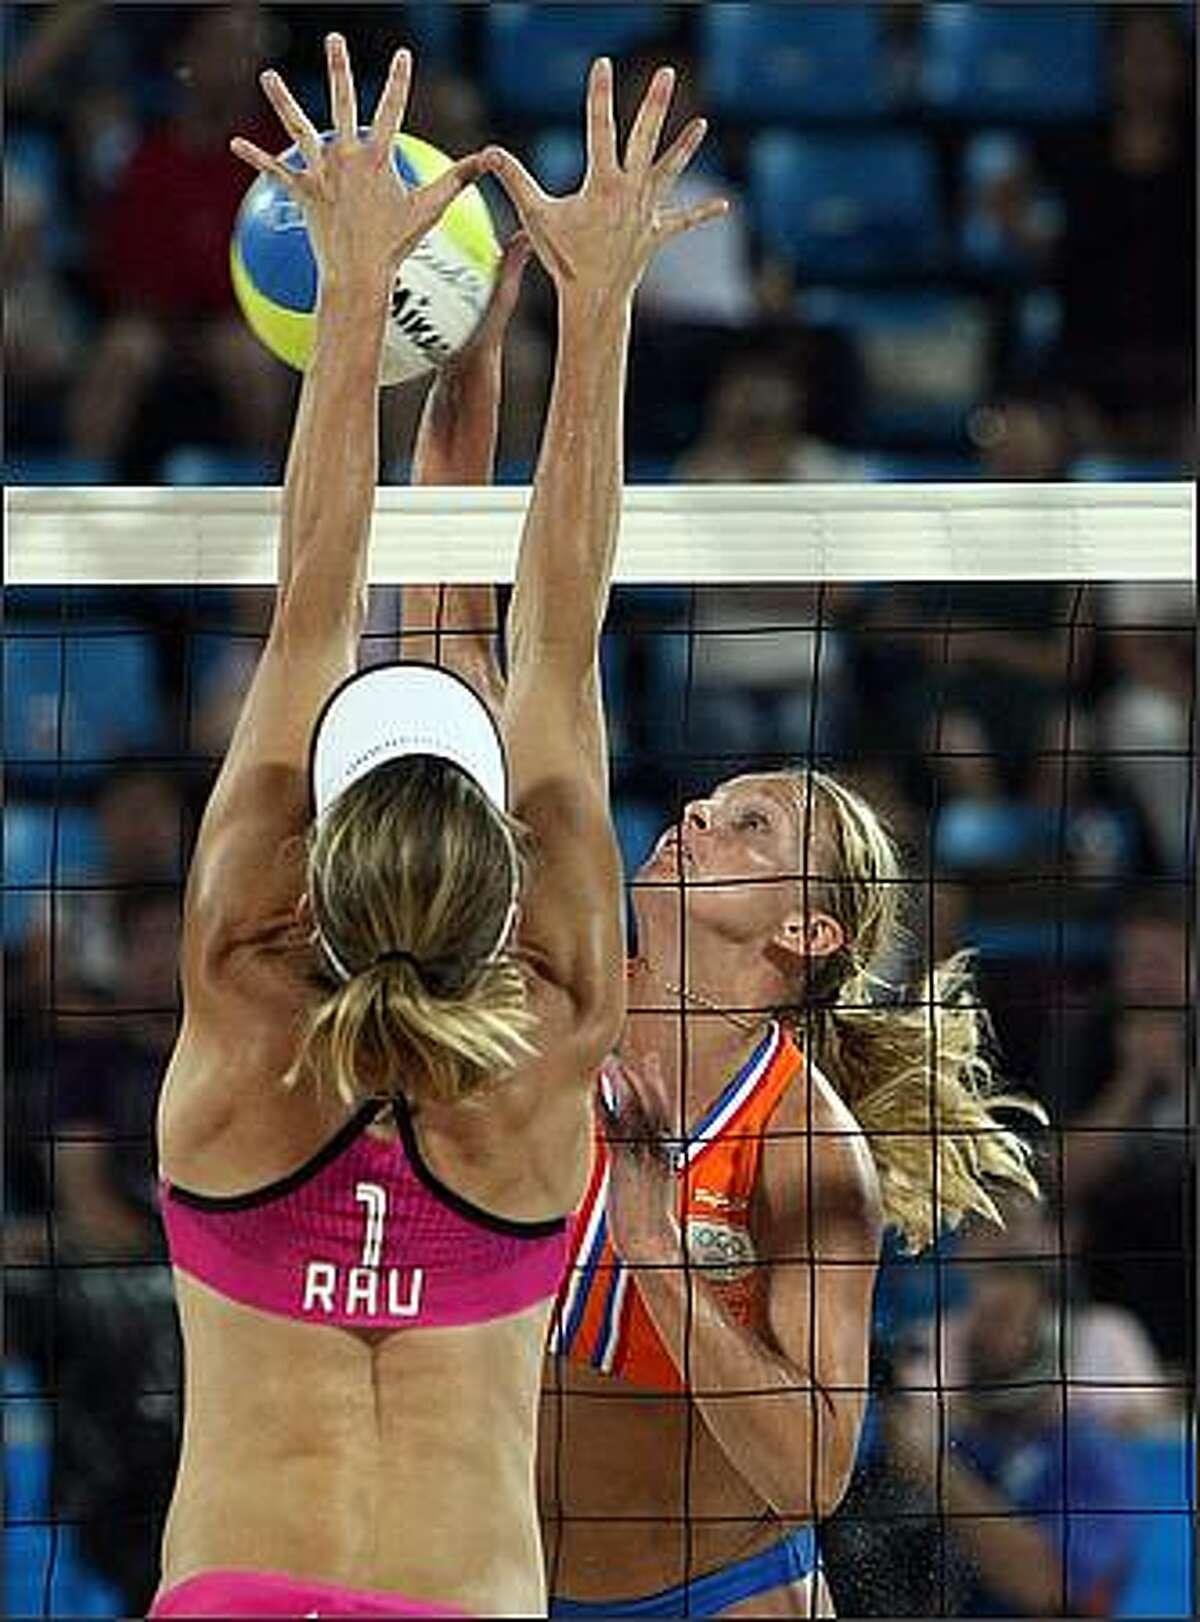 Germany's Okka Rau (L) blocks a smash from Dutch Rebekka Kadijk during their Women's preliminary beach volleyball match of the 2008 Beijing Olympic Games at Beijing's Chaoyang Park Beach Volleyball Ground. Germany won 2-1. (Photo THOMAS COEX/AFP/Getty Images)